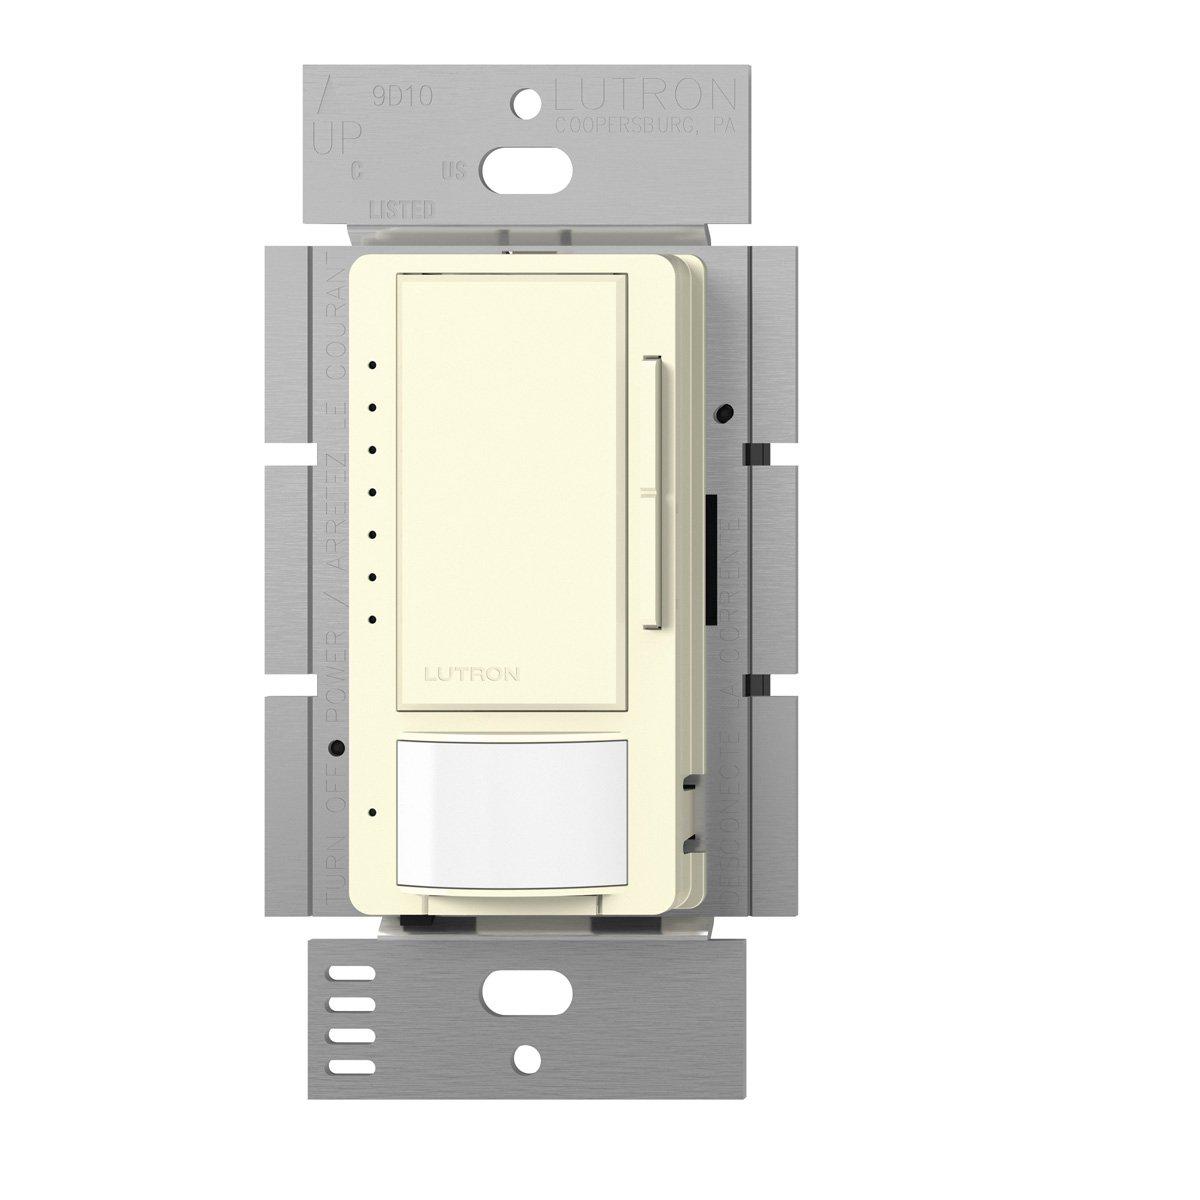 Lutron Maestro CL単極/ multi-location Vacancy Sensingディマー MSCL-VP153M-LA 1 B00FQL25GK Light Almond Light Almond